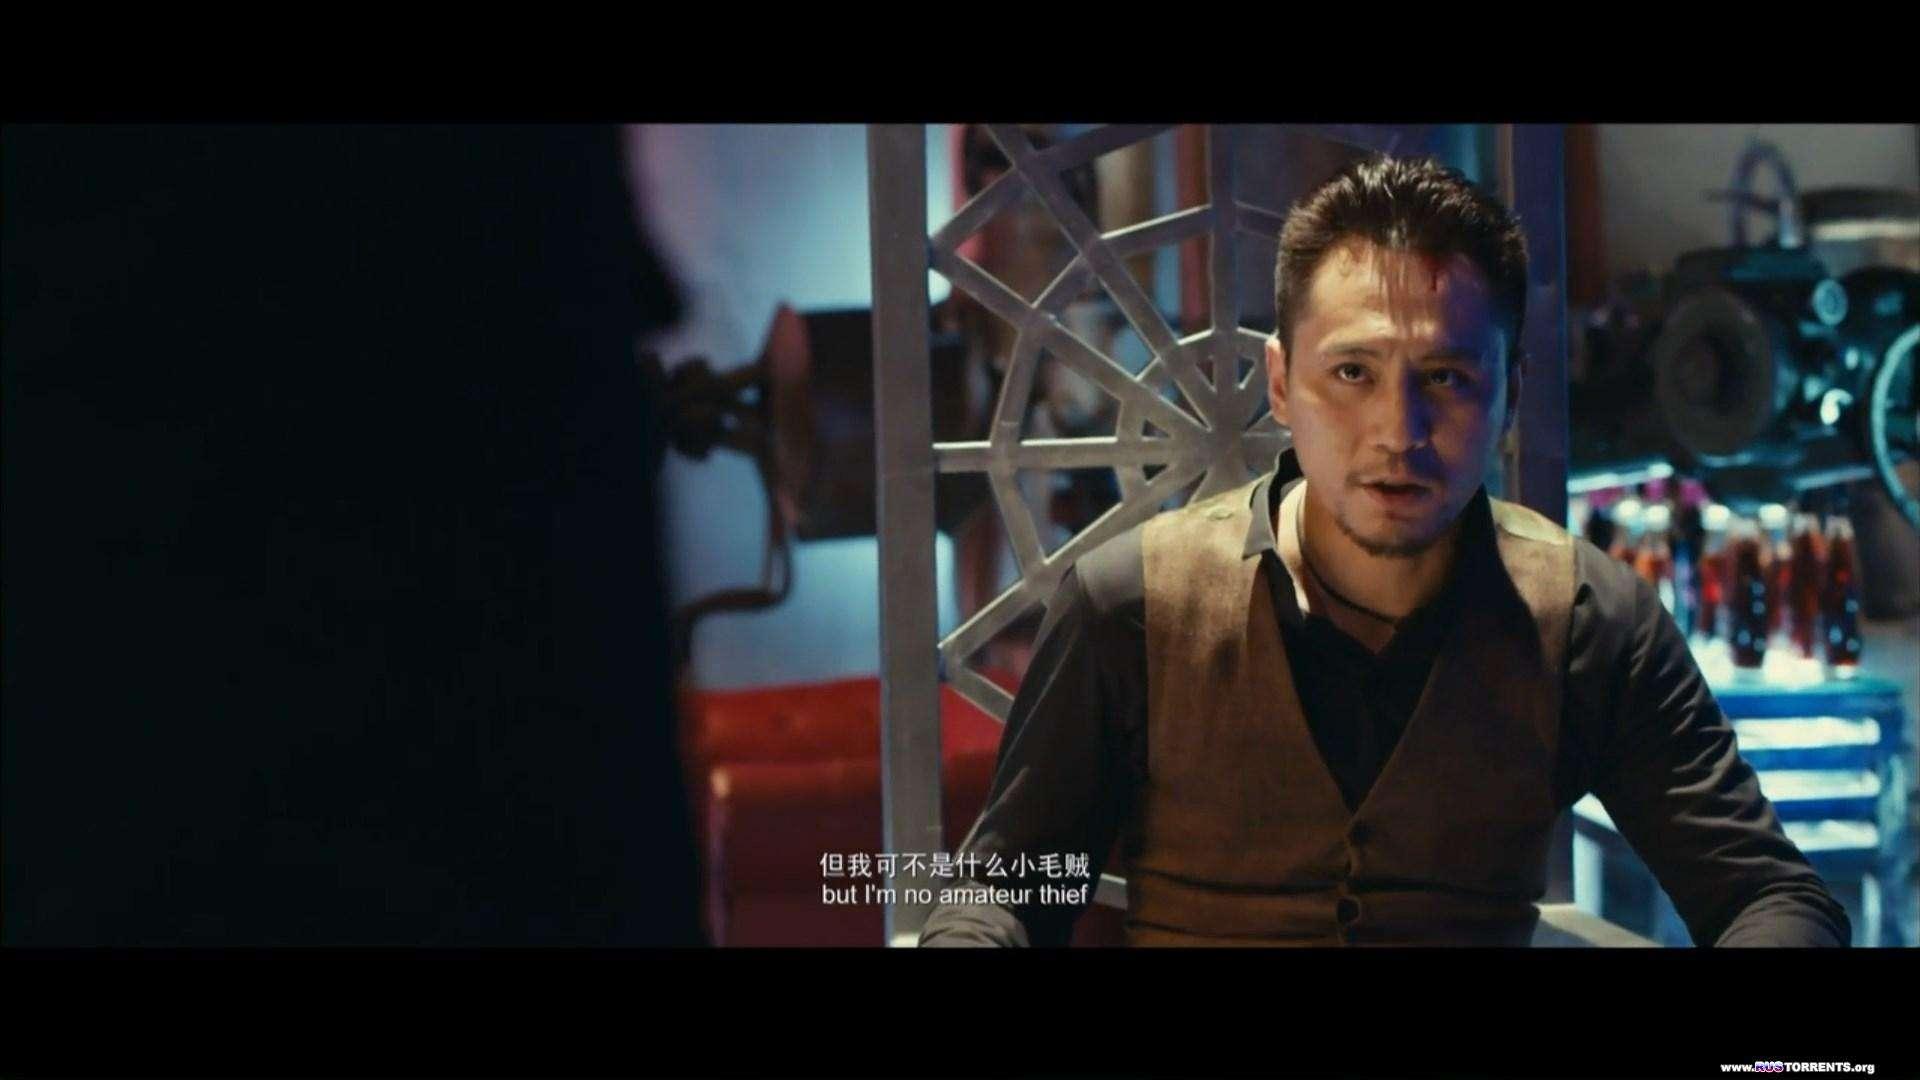 ����������� ������� 2014 | HDTVRip 1080p